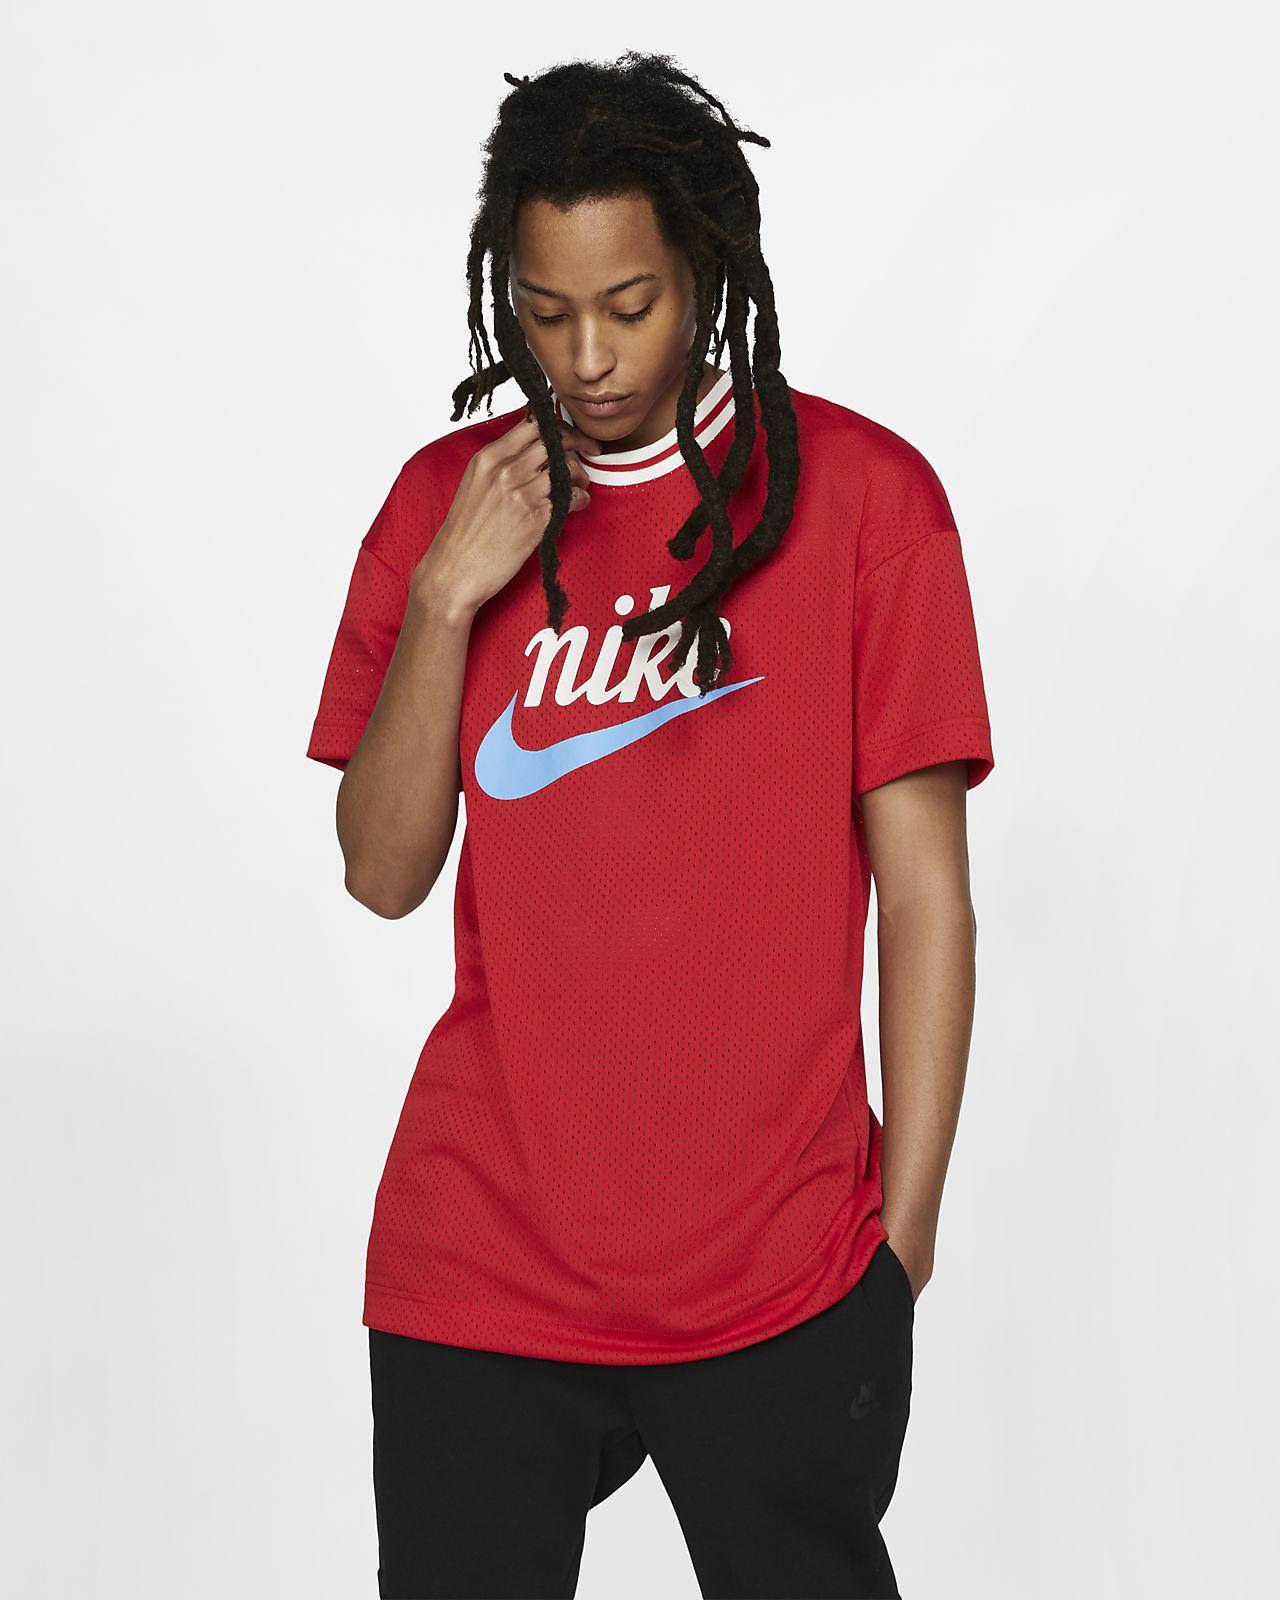 Nike Sportswear Men's Mesh Graphic Top